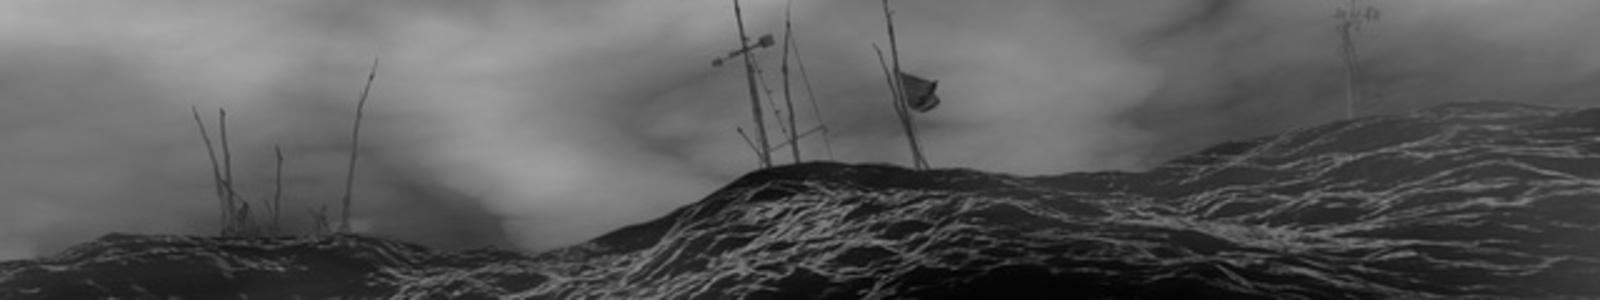 Arkhipelagos (Navigating the Tides of Time)